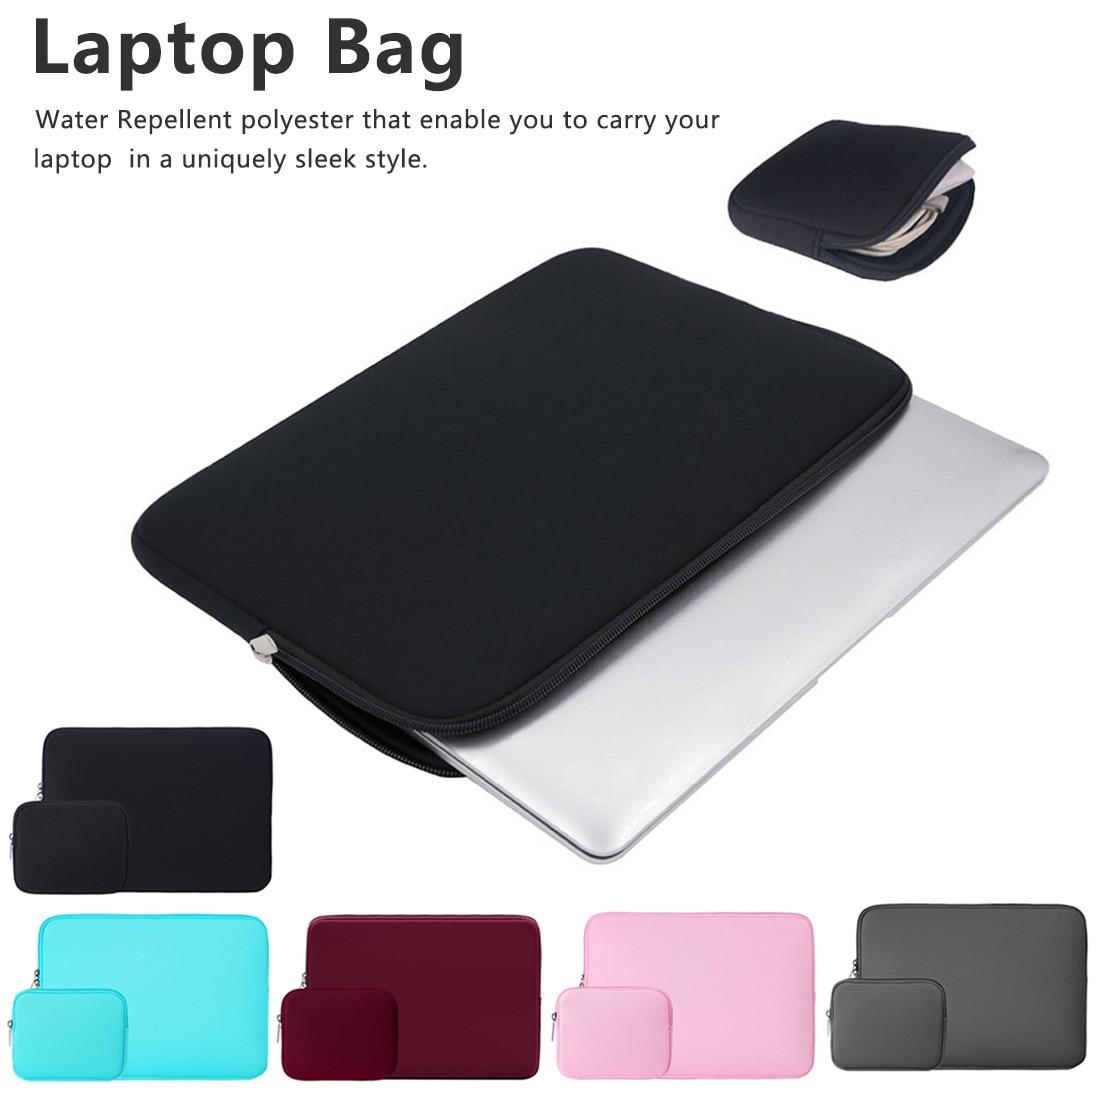 Portable Laptop Sleeve Case Cover Computer Liner Bag for Macbook Tablet Notebook Waterproof Wear-resisting 11,13,14,15,15.6 Inch